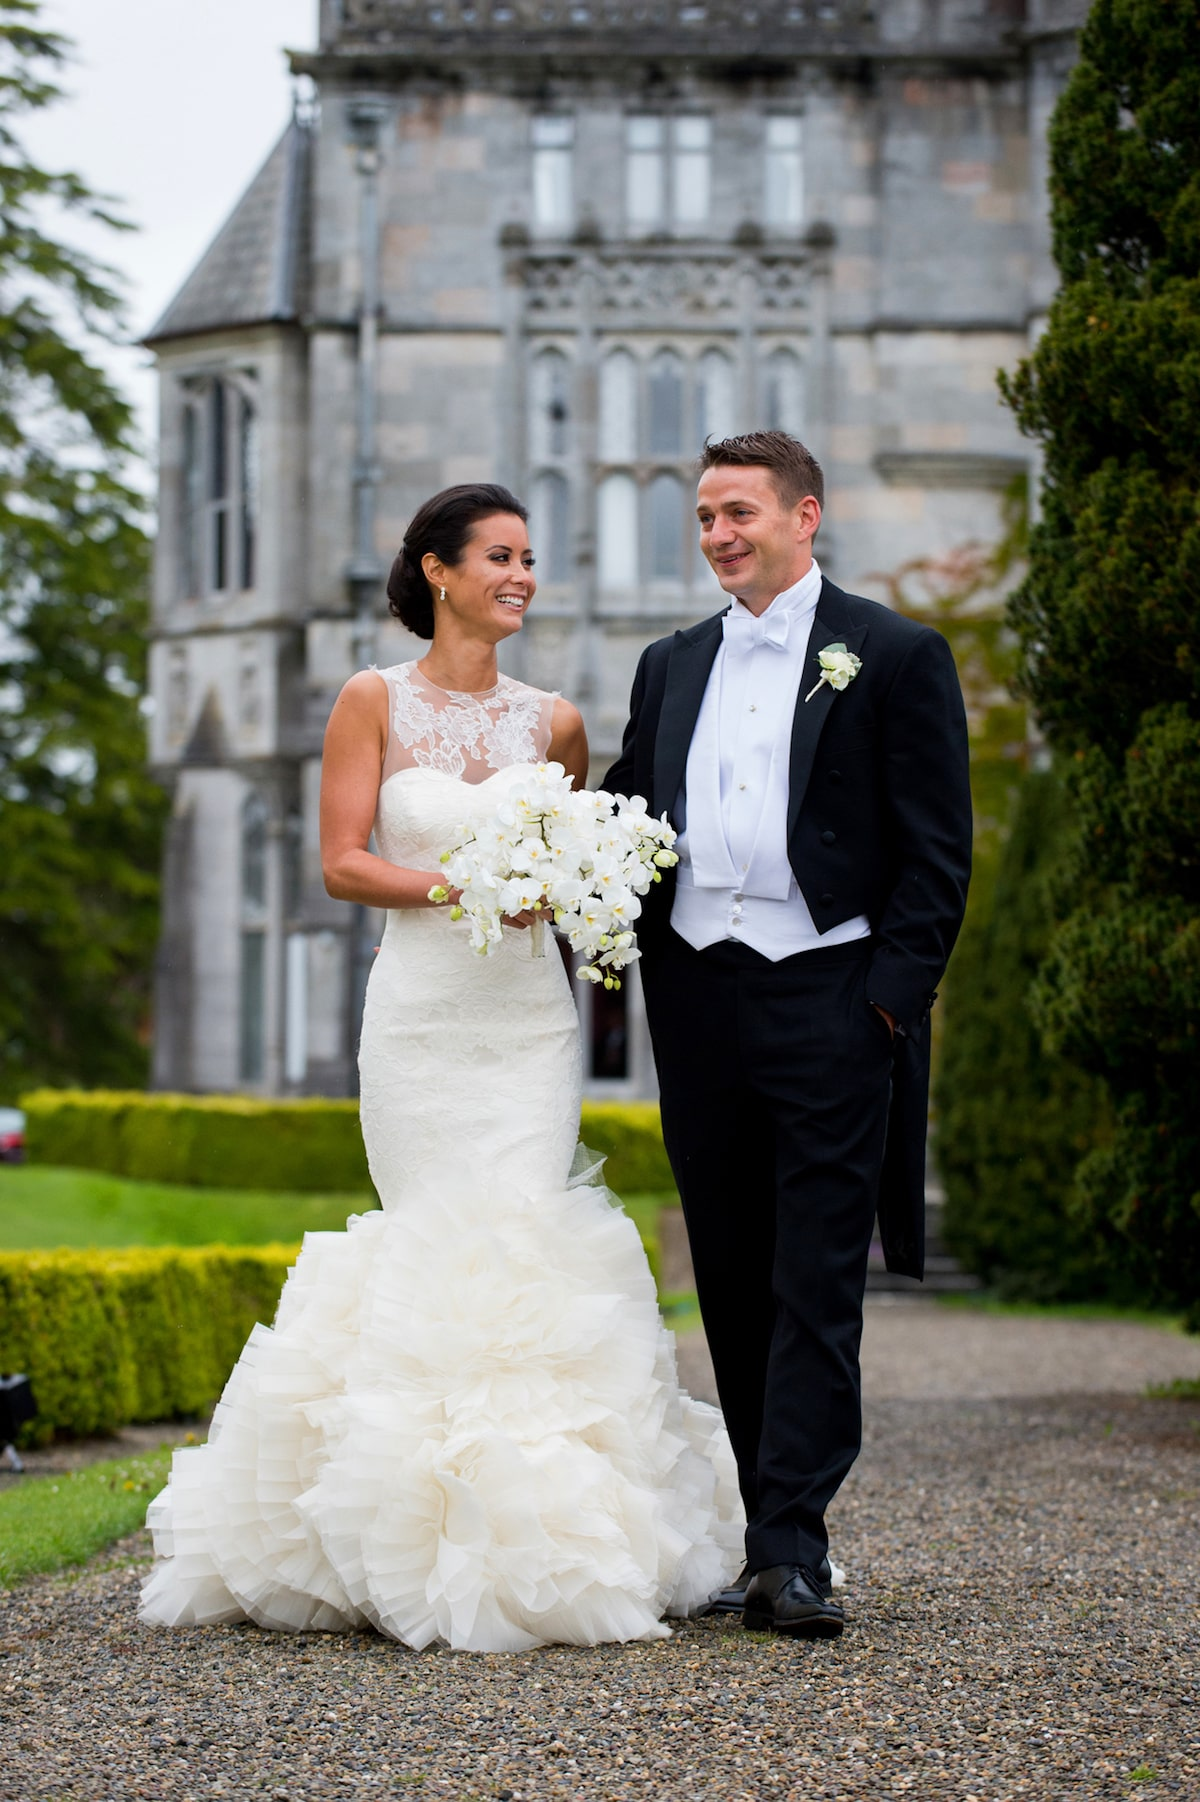 Dublin Wedding Planner Guide to Planning a Destination Wedding